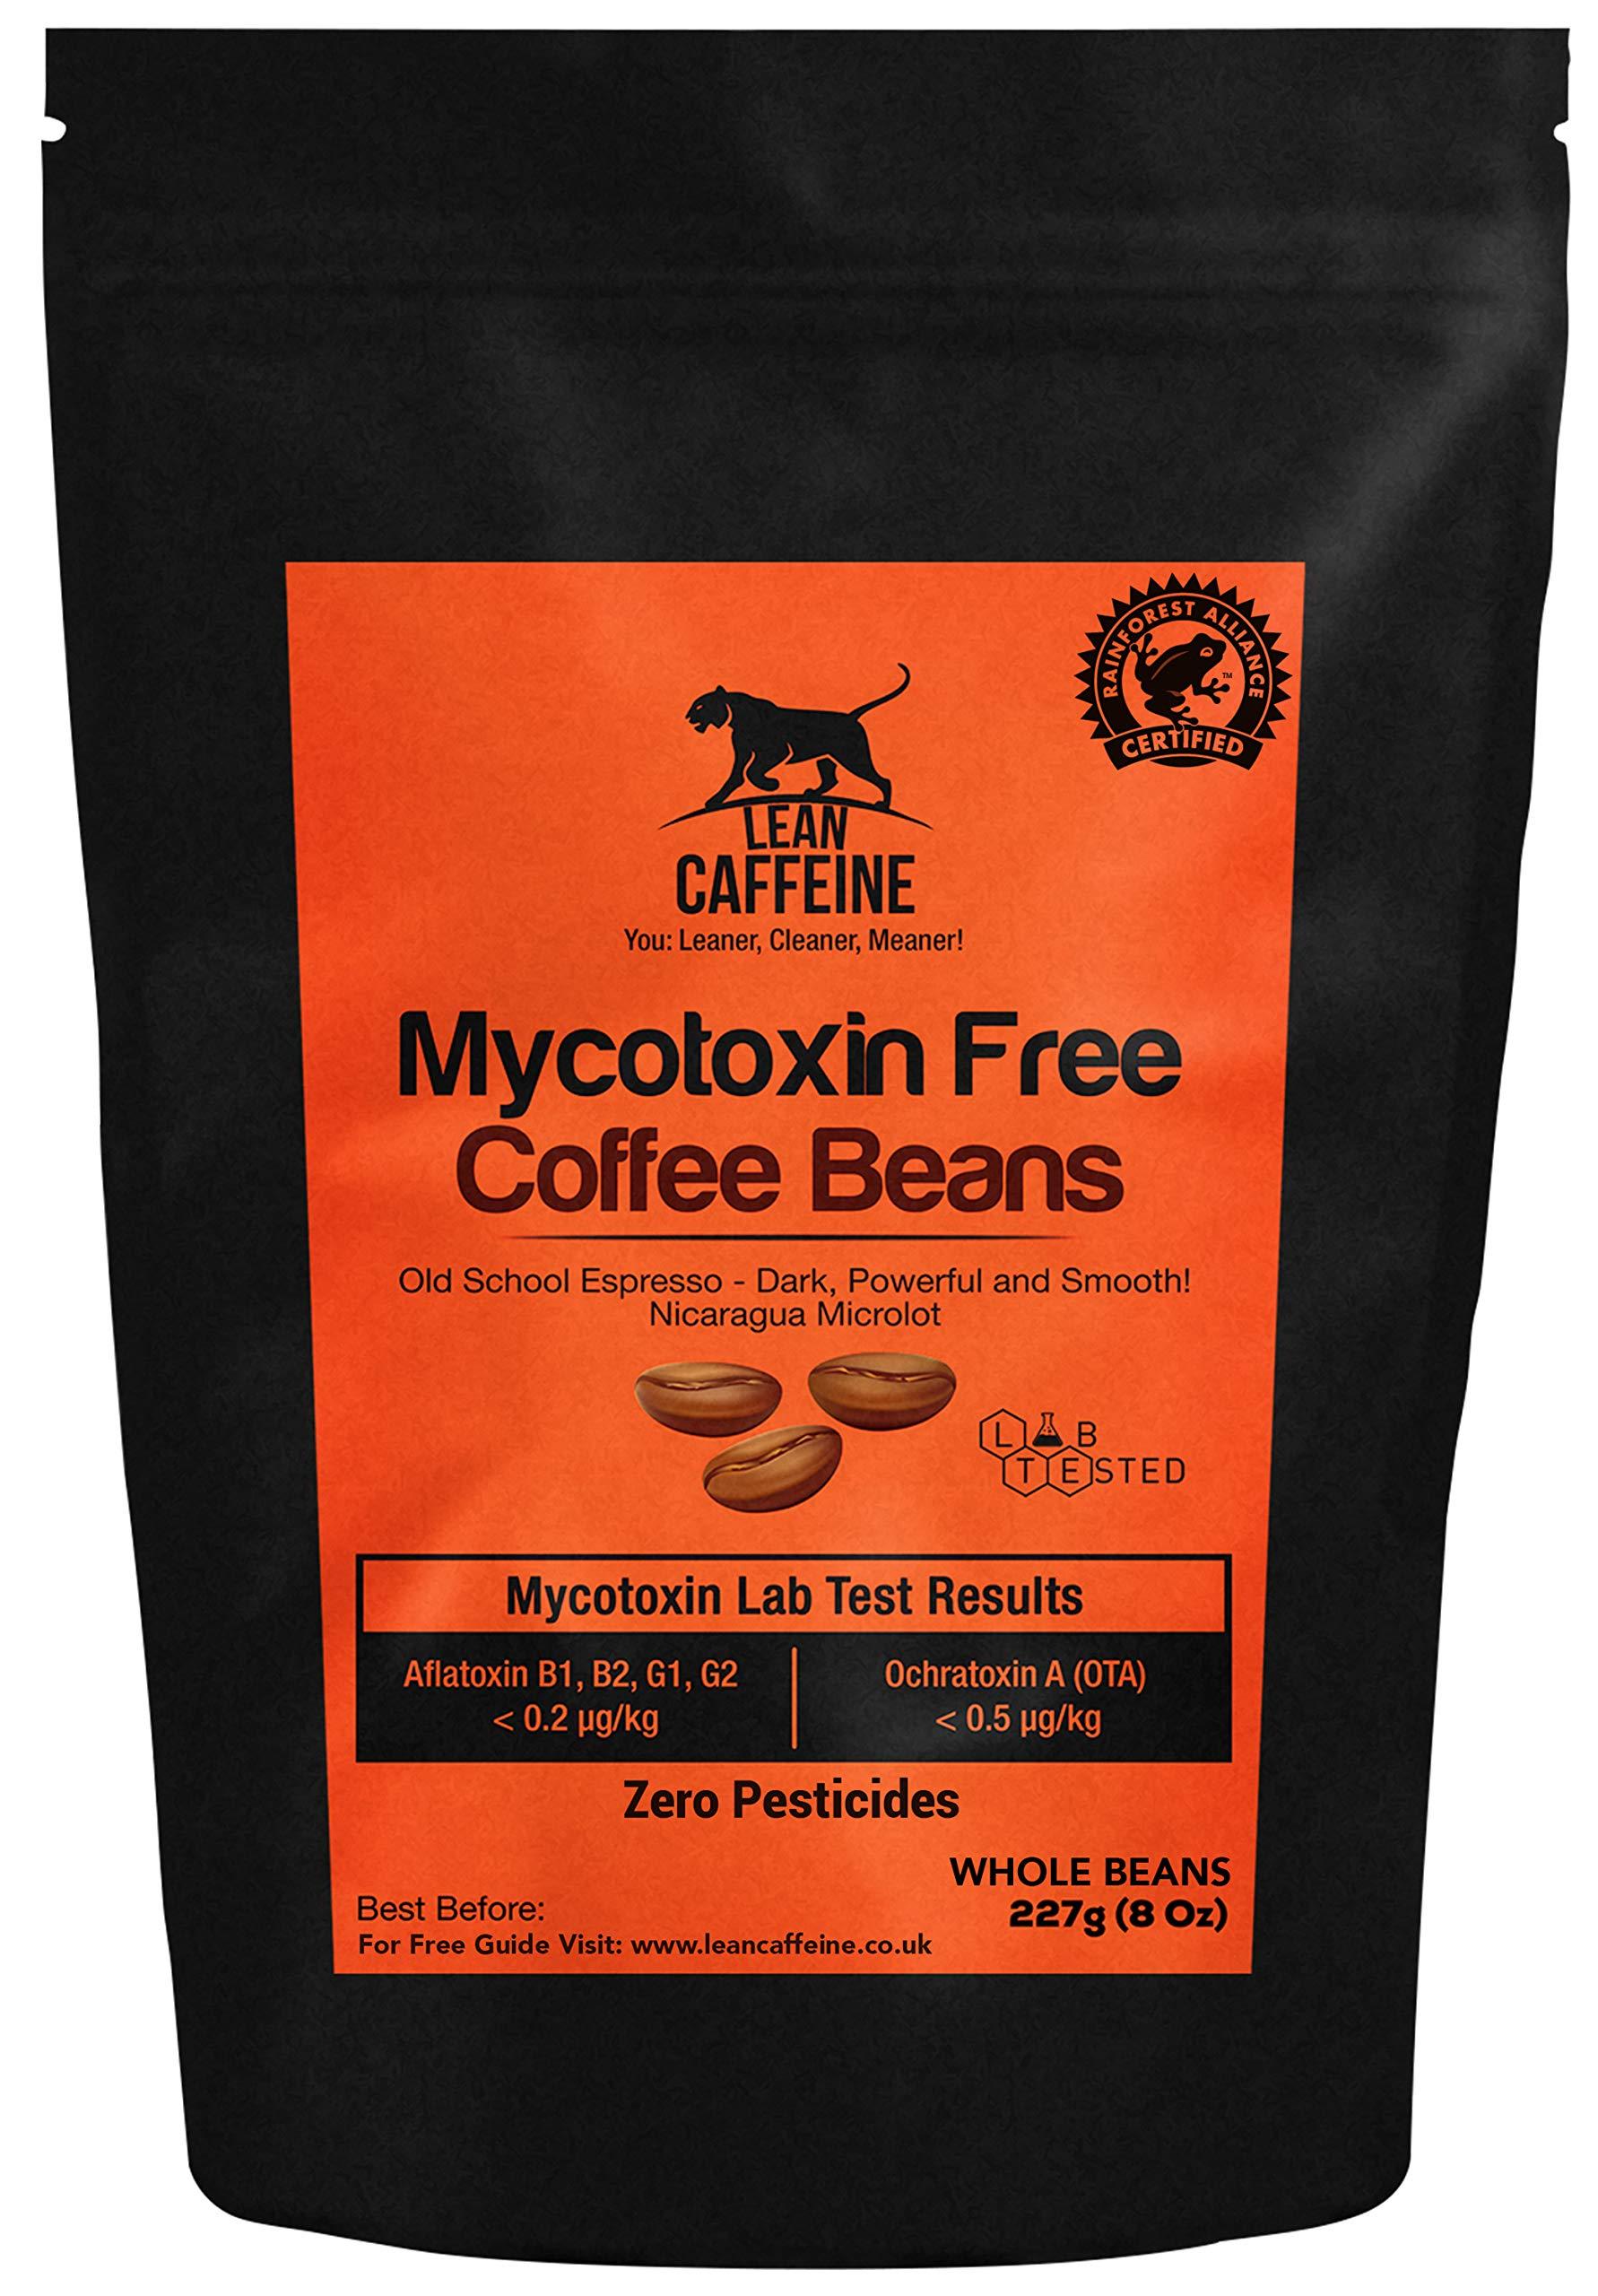 Bulletproof Coffee Beans 227 Gram | No Pesticides / Mycotoxins | Upgraded Coffee Beans 227 Gram Lean Caffeine